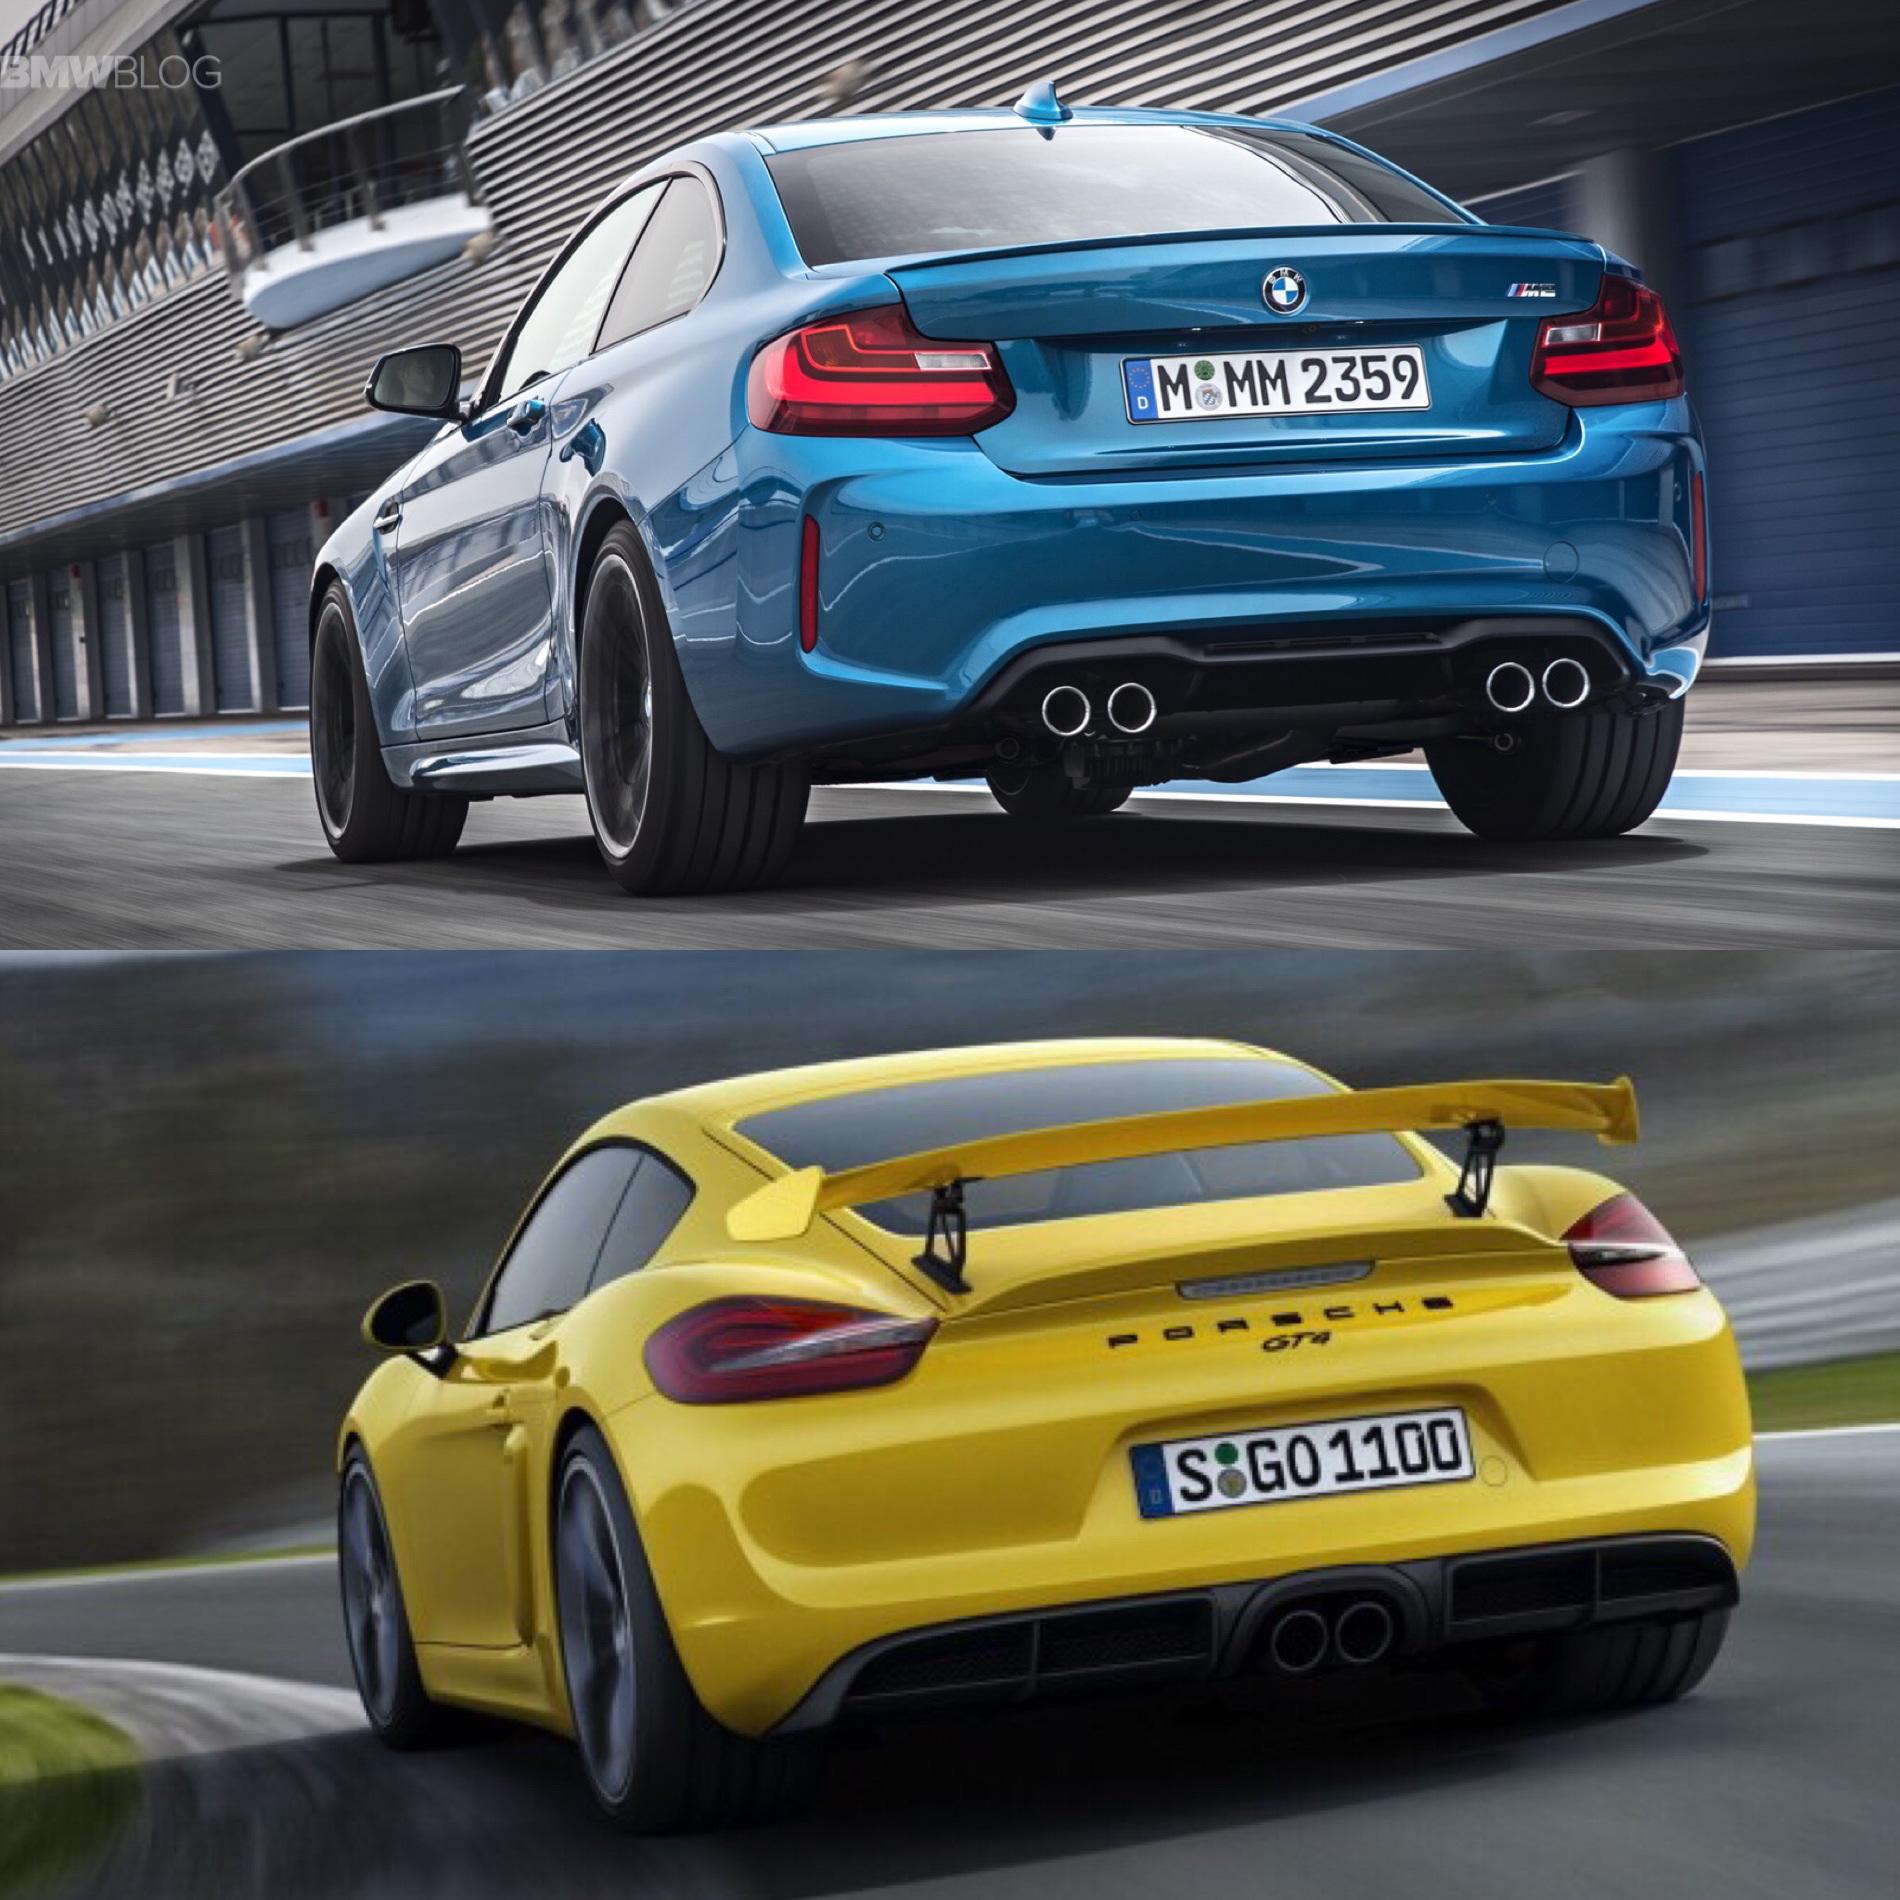 Porsche 911 Gts Engine: BMW M2 Vs Porsche Cayman GT4